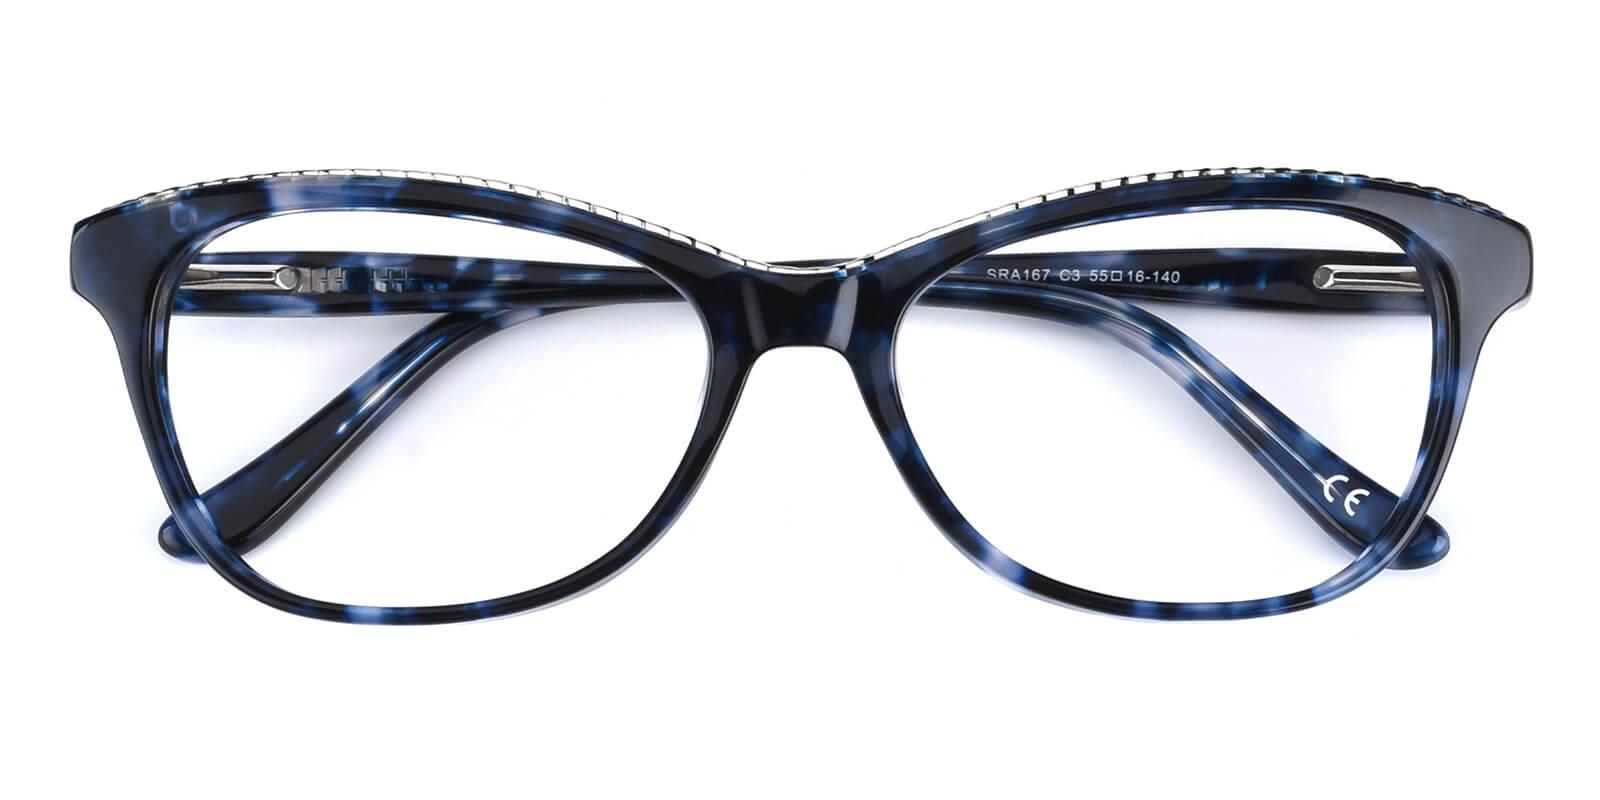 Her-Striped-Cat-Acetate-Eyeglasses-detail